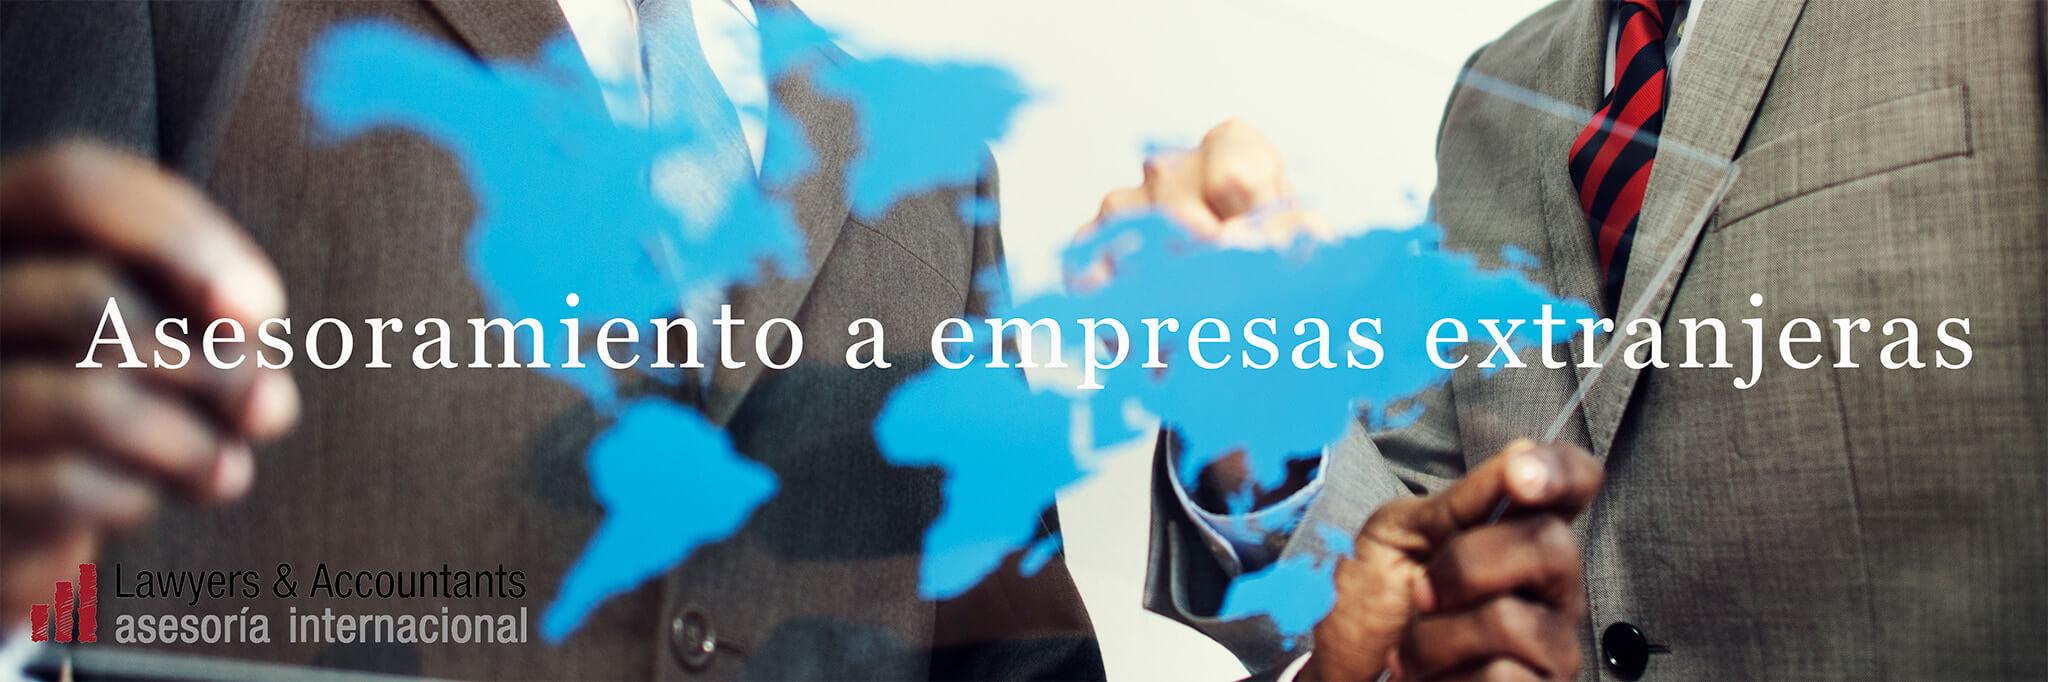 asesoramiento a empresas extranjeras